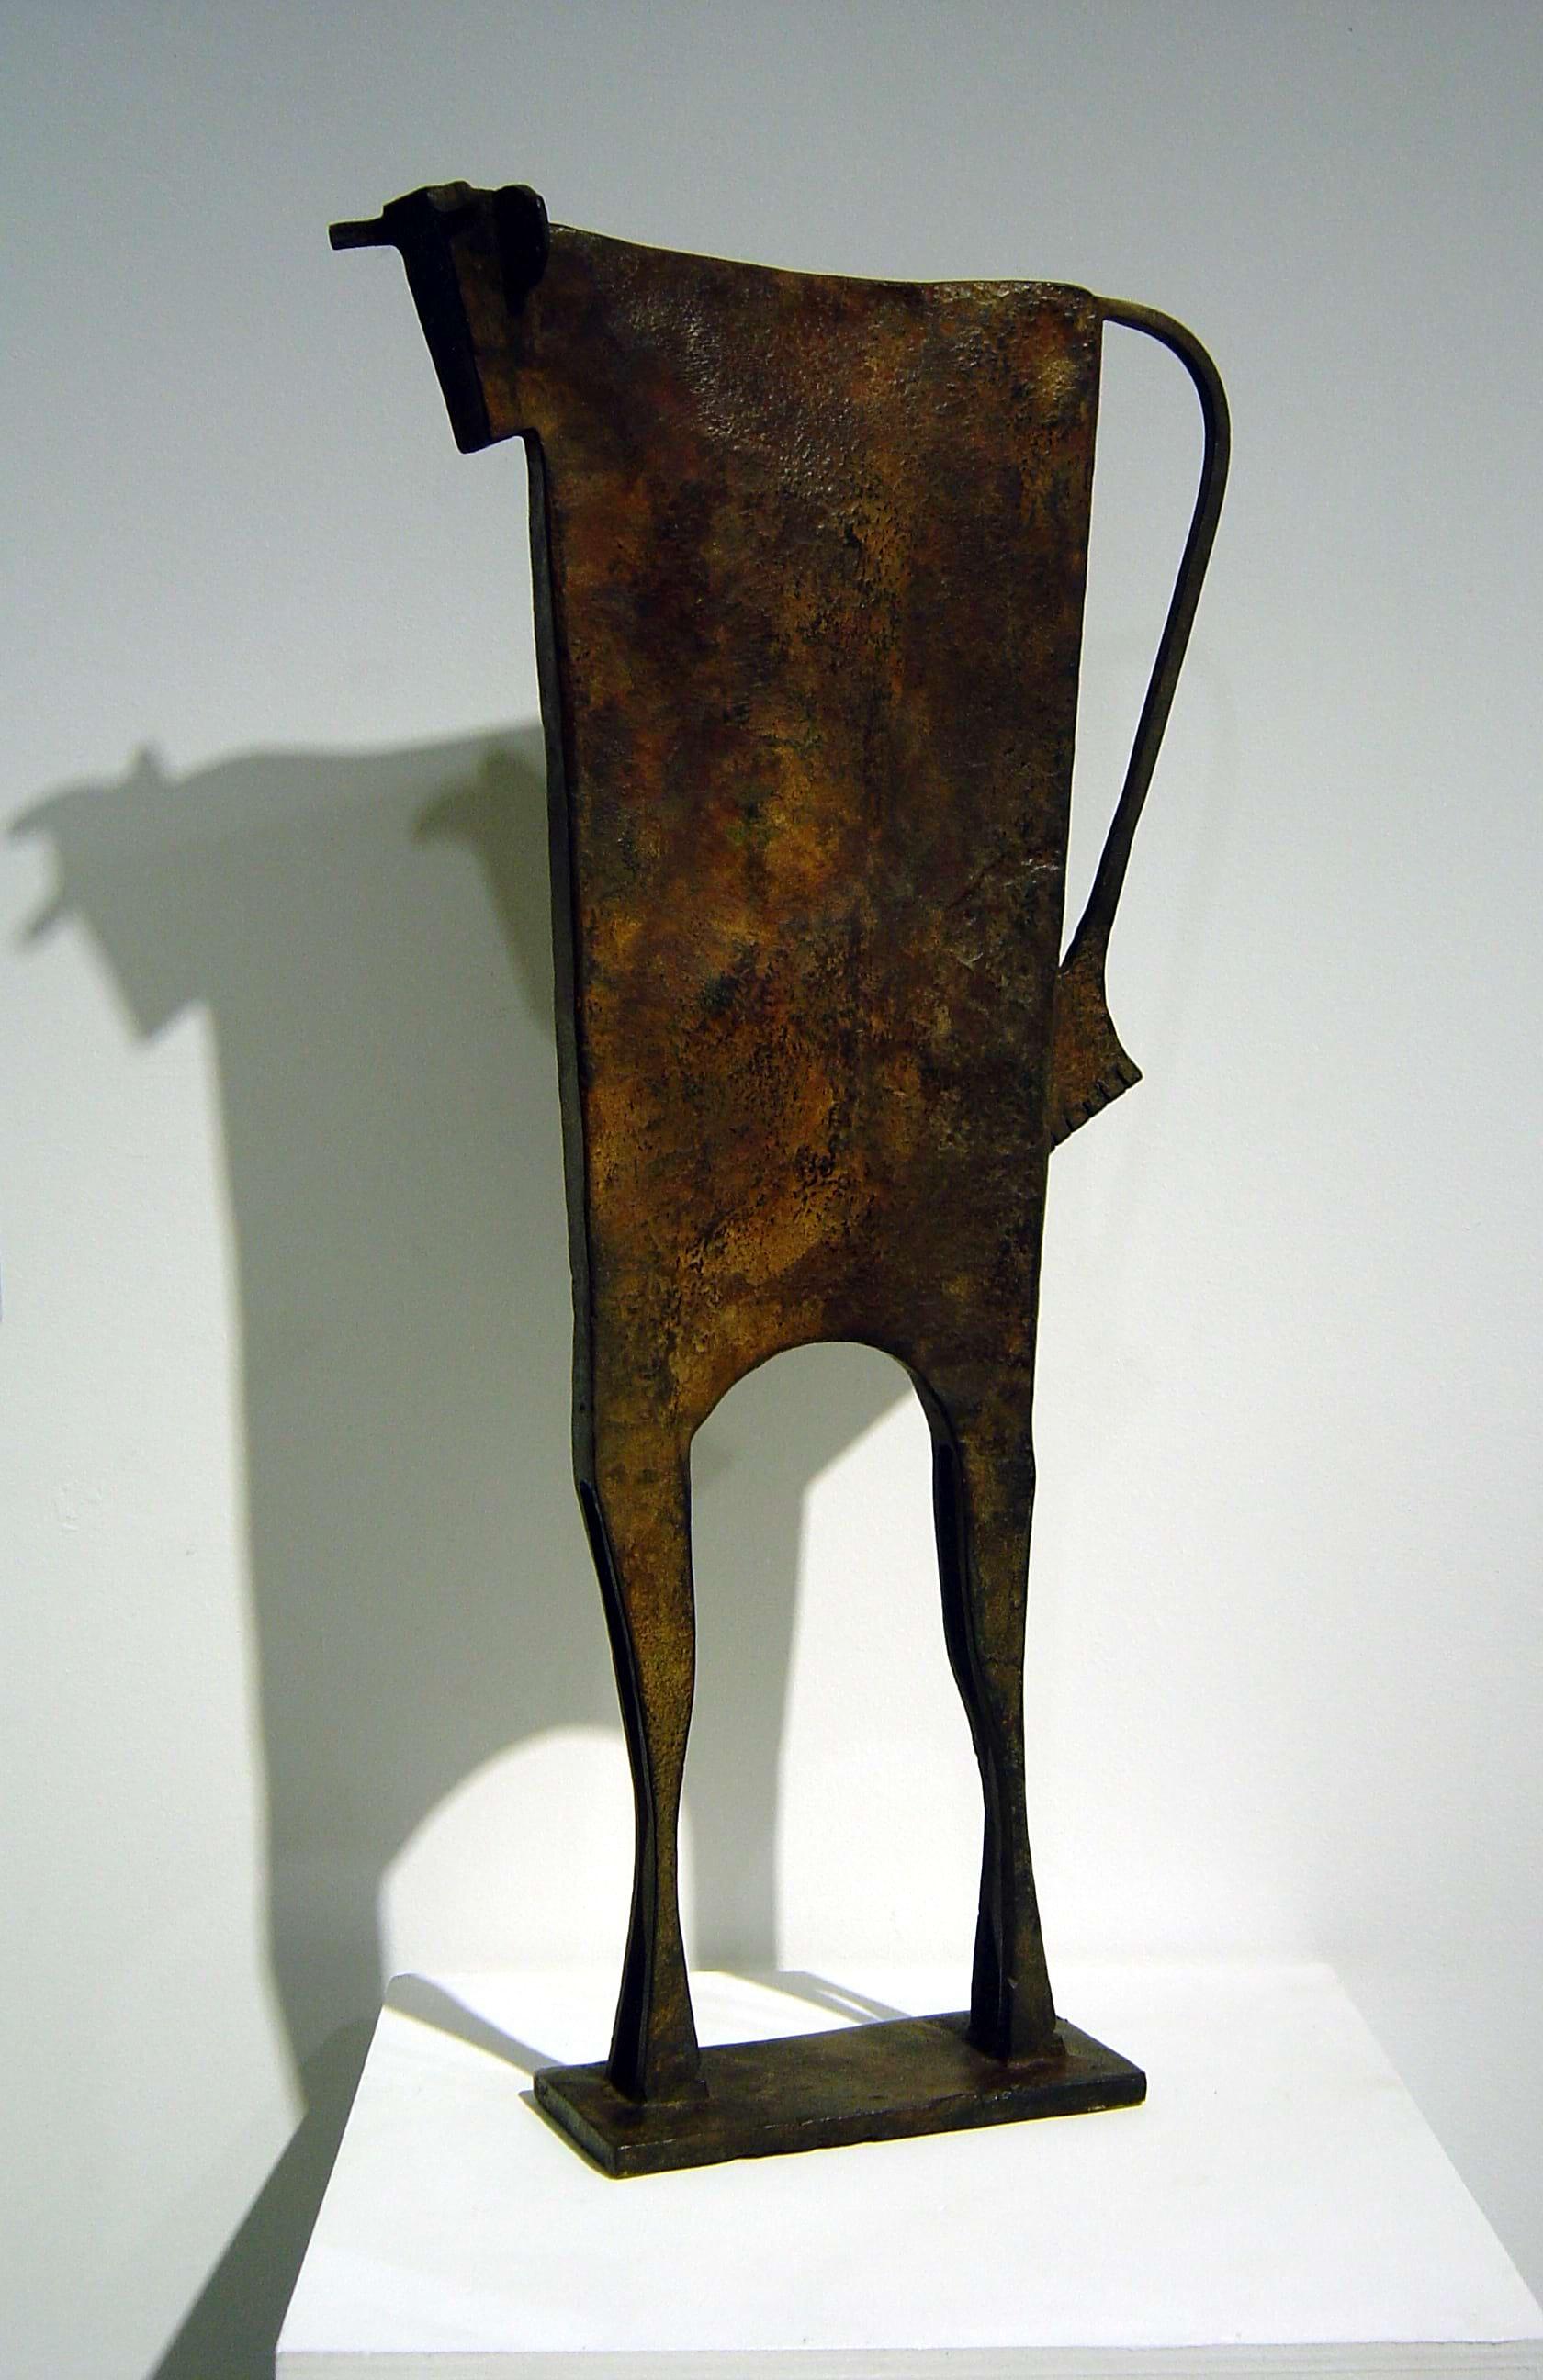 TORO CENILYO Bronze 72x36x9,5cm / 28,3x14,1x3,7 inches